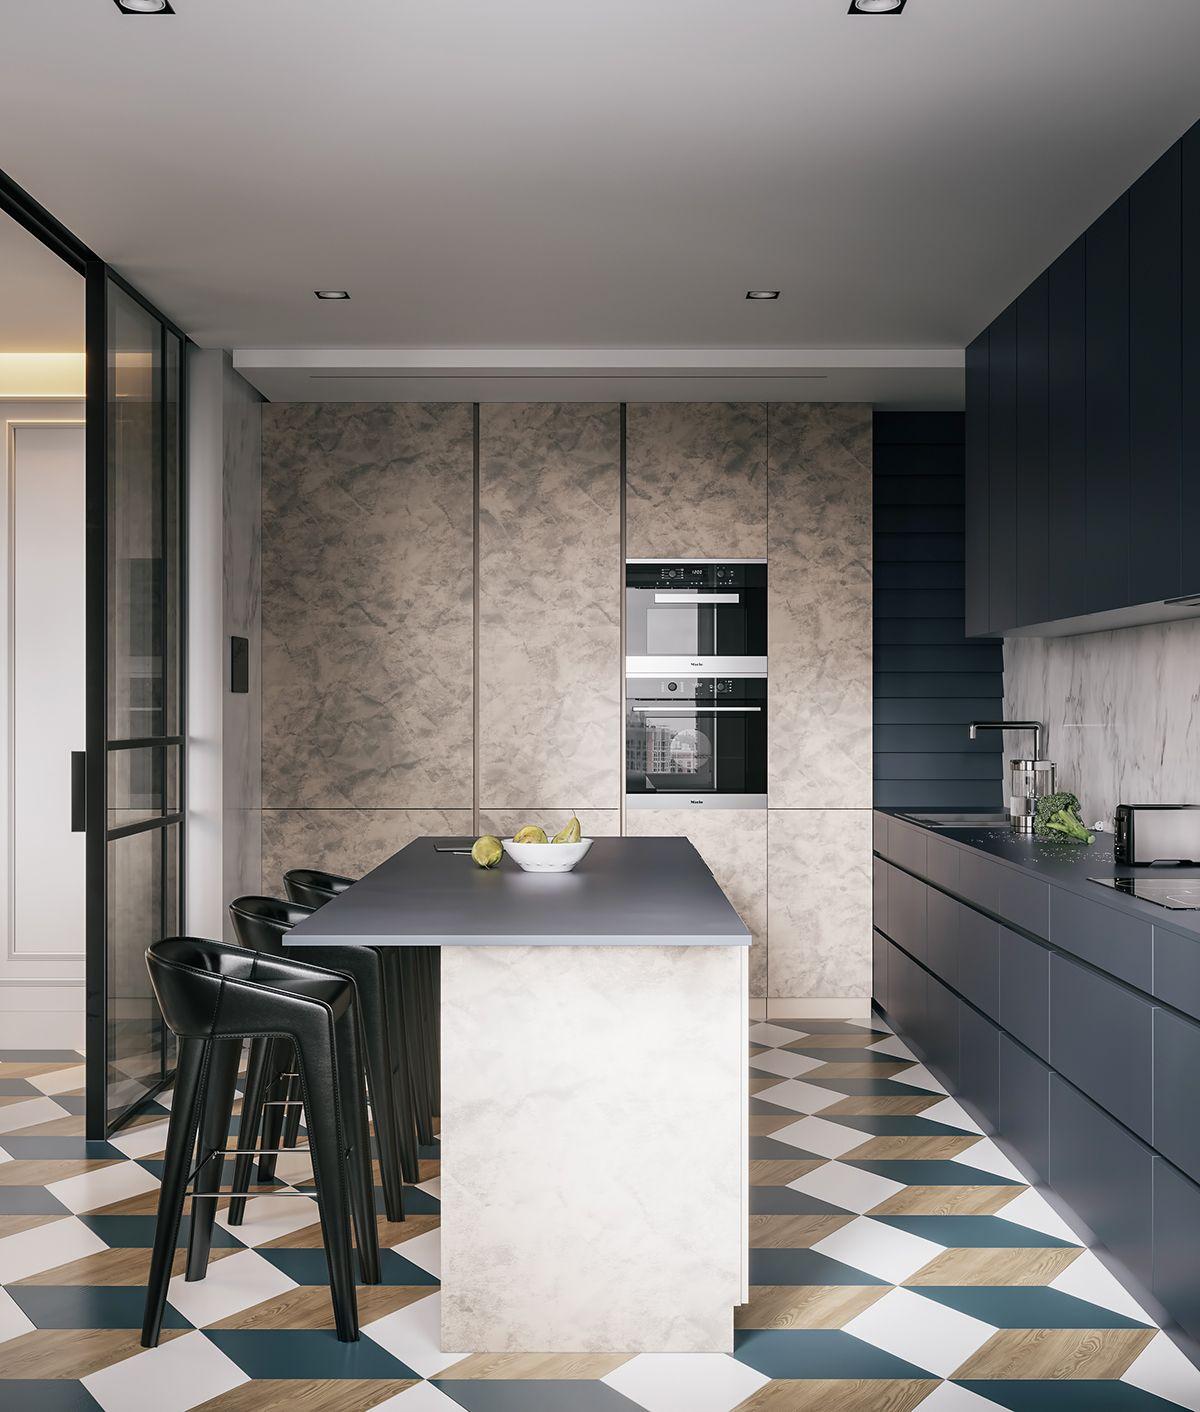 Modernized Bungalow Kitchen Renovation: Modern Classic On Behance